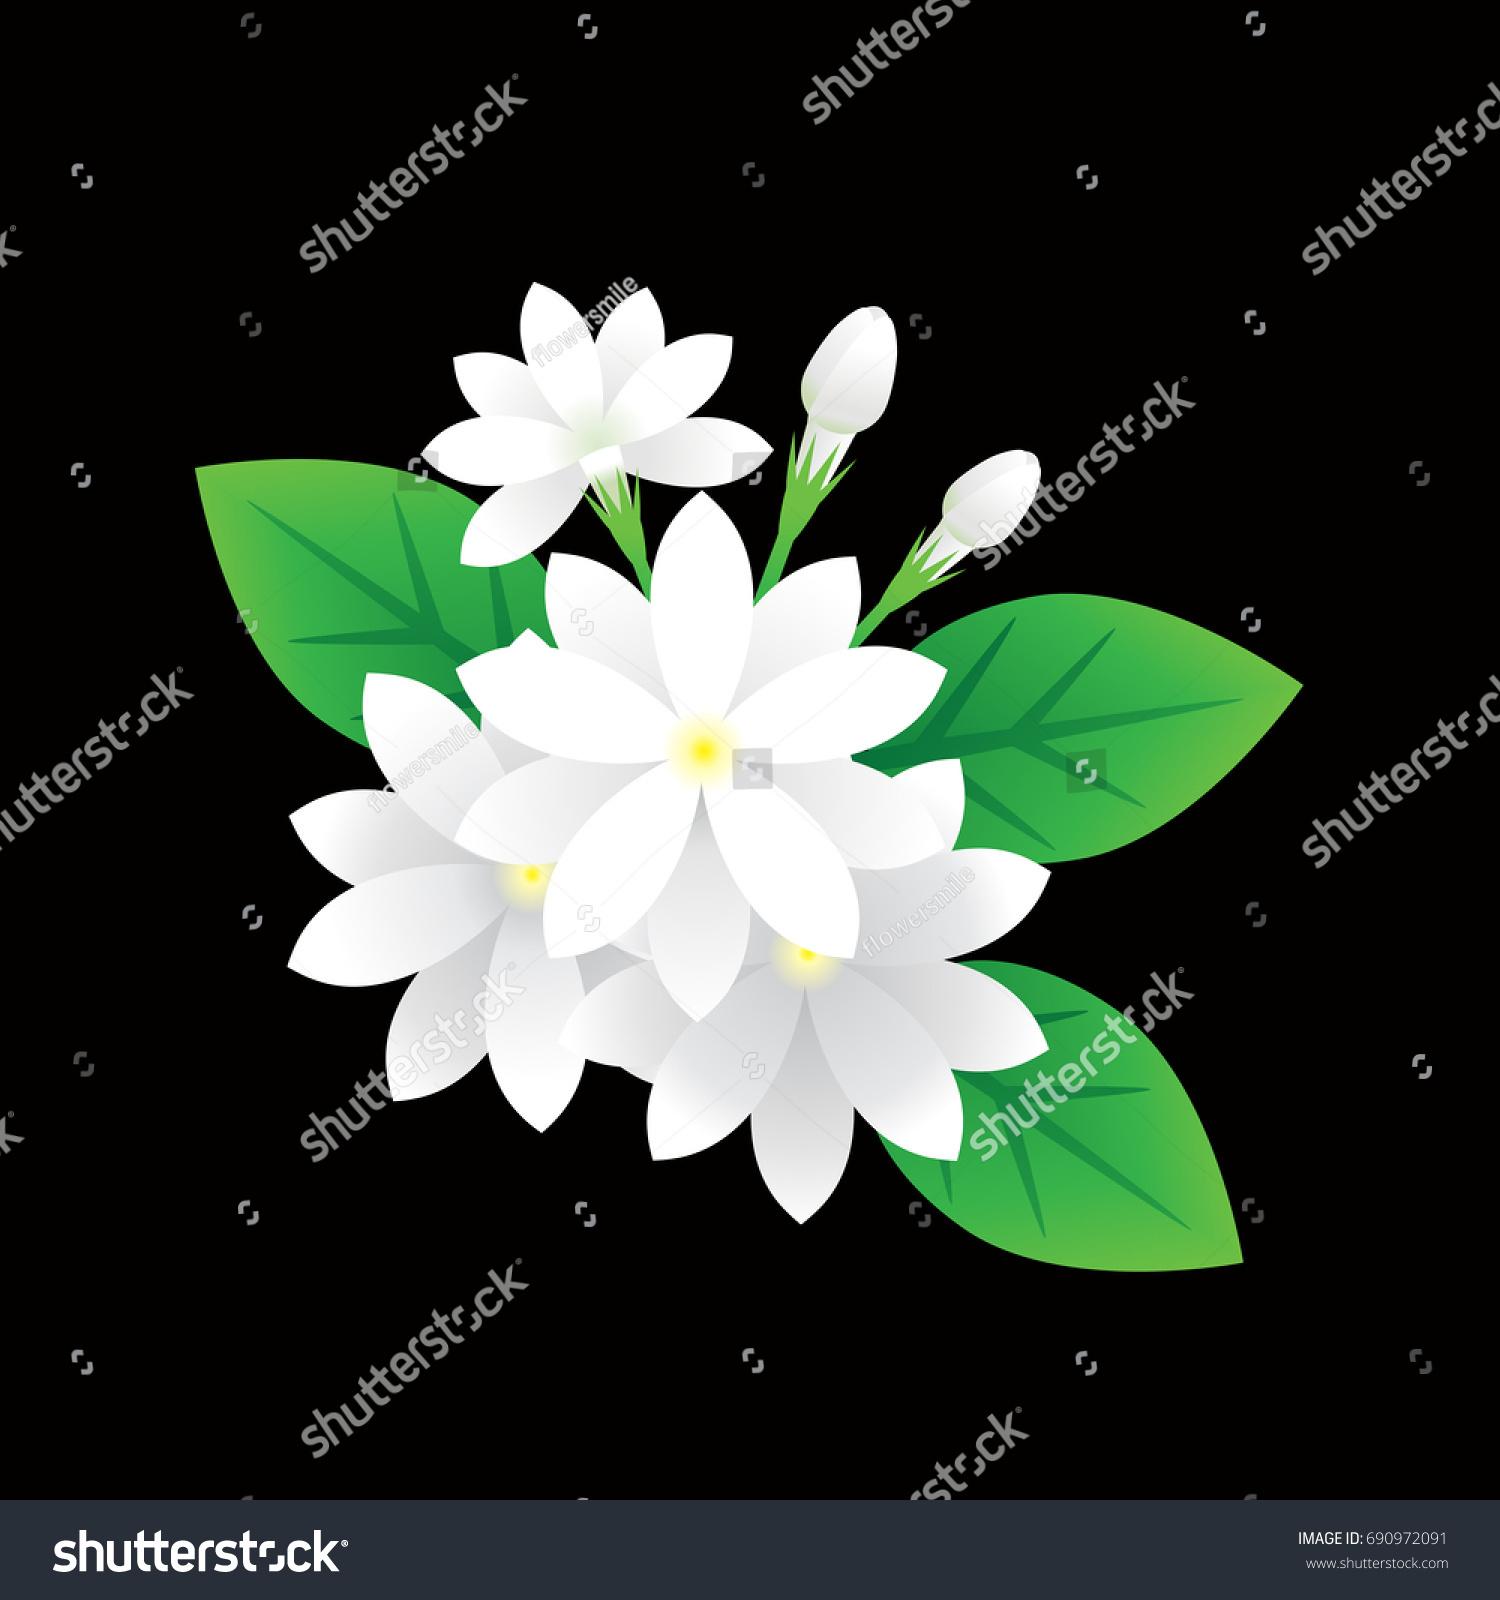 Jasmine flower vector on black background stock vector royalty free jasmine flower vector on black background symbol for mother day in thailand beautiful flora izmirmasajfo